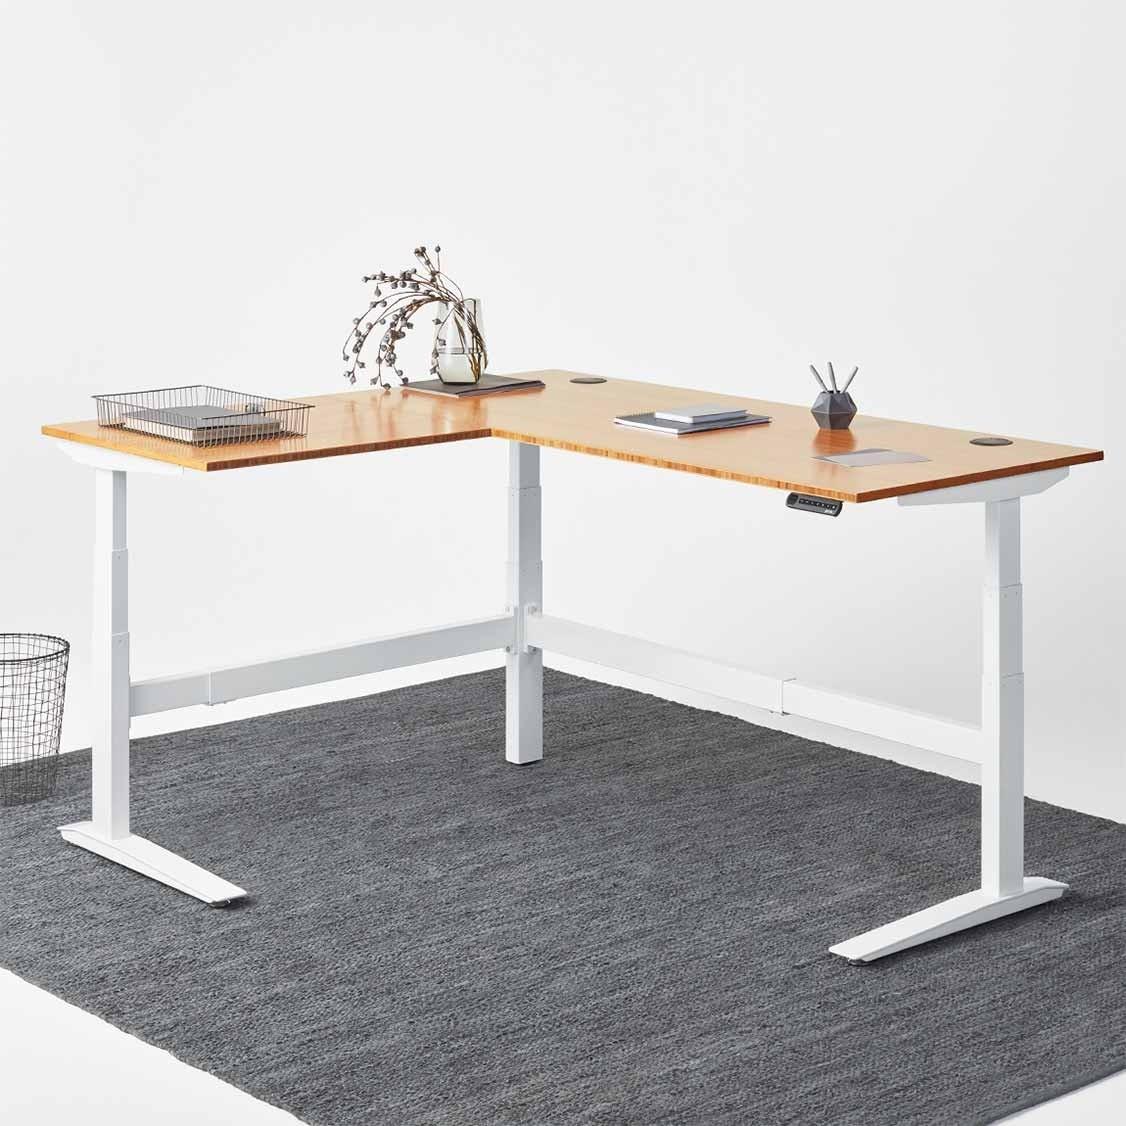 l-shaped desk jarvis l-shaped bamboo high table ... XBUGWHJ